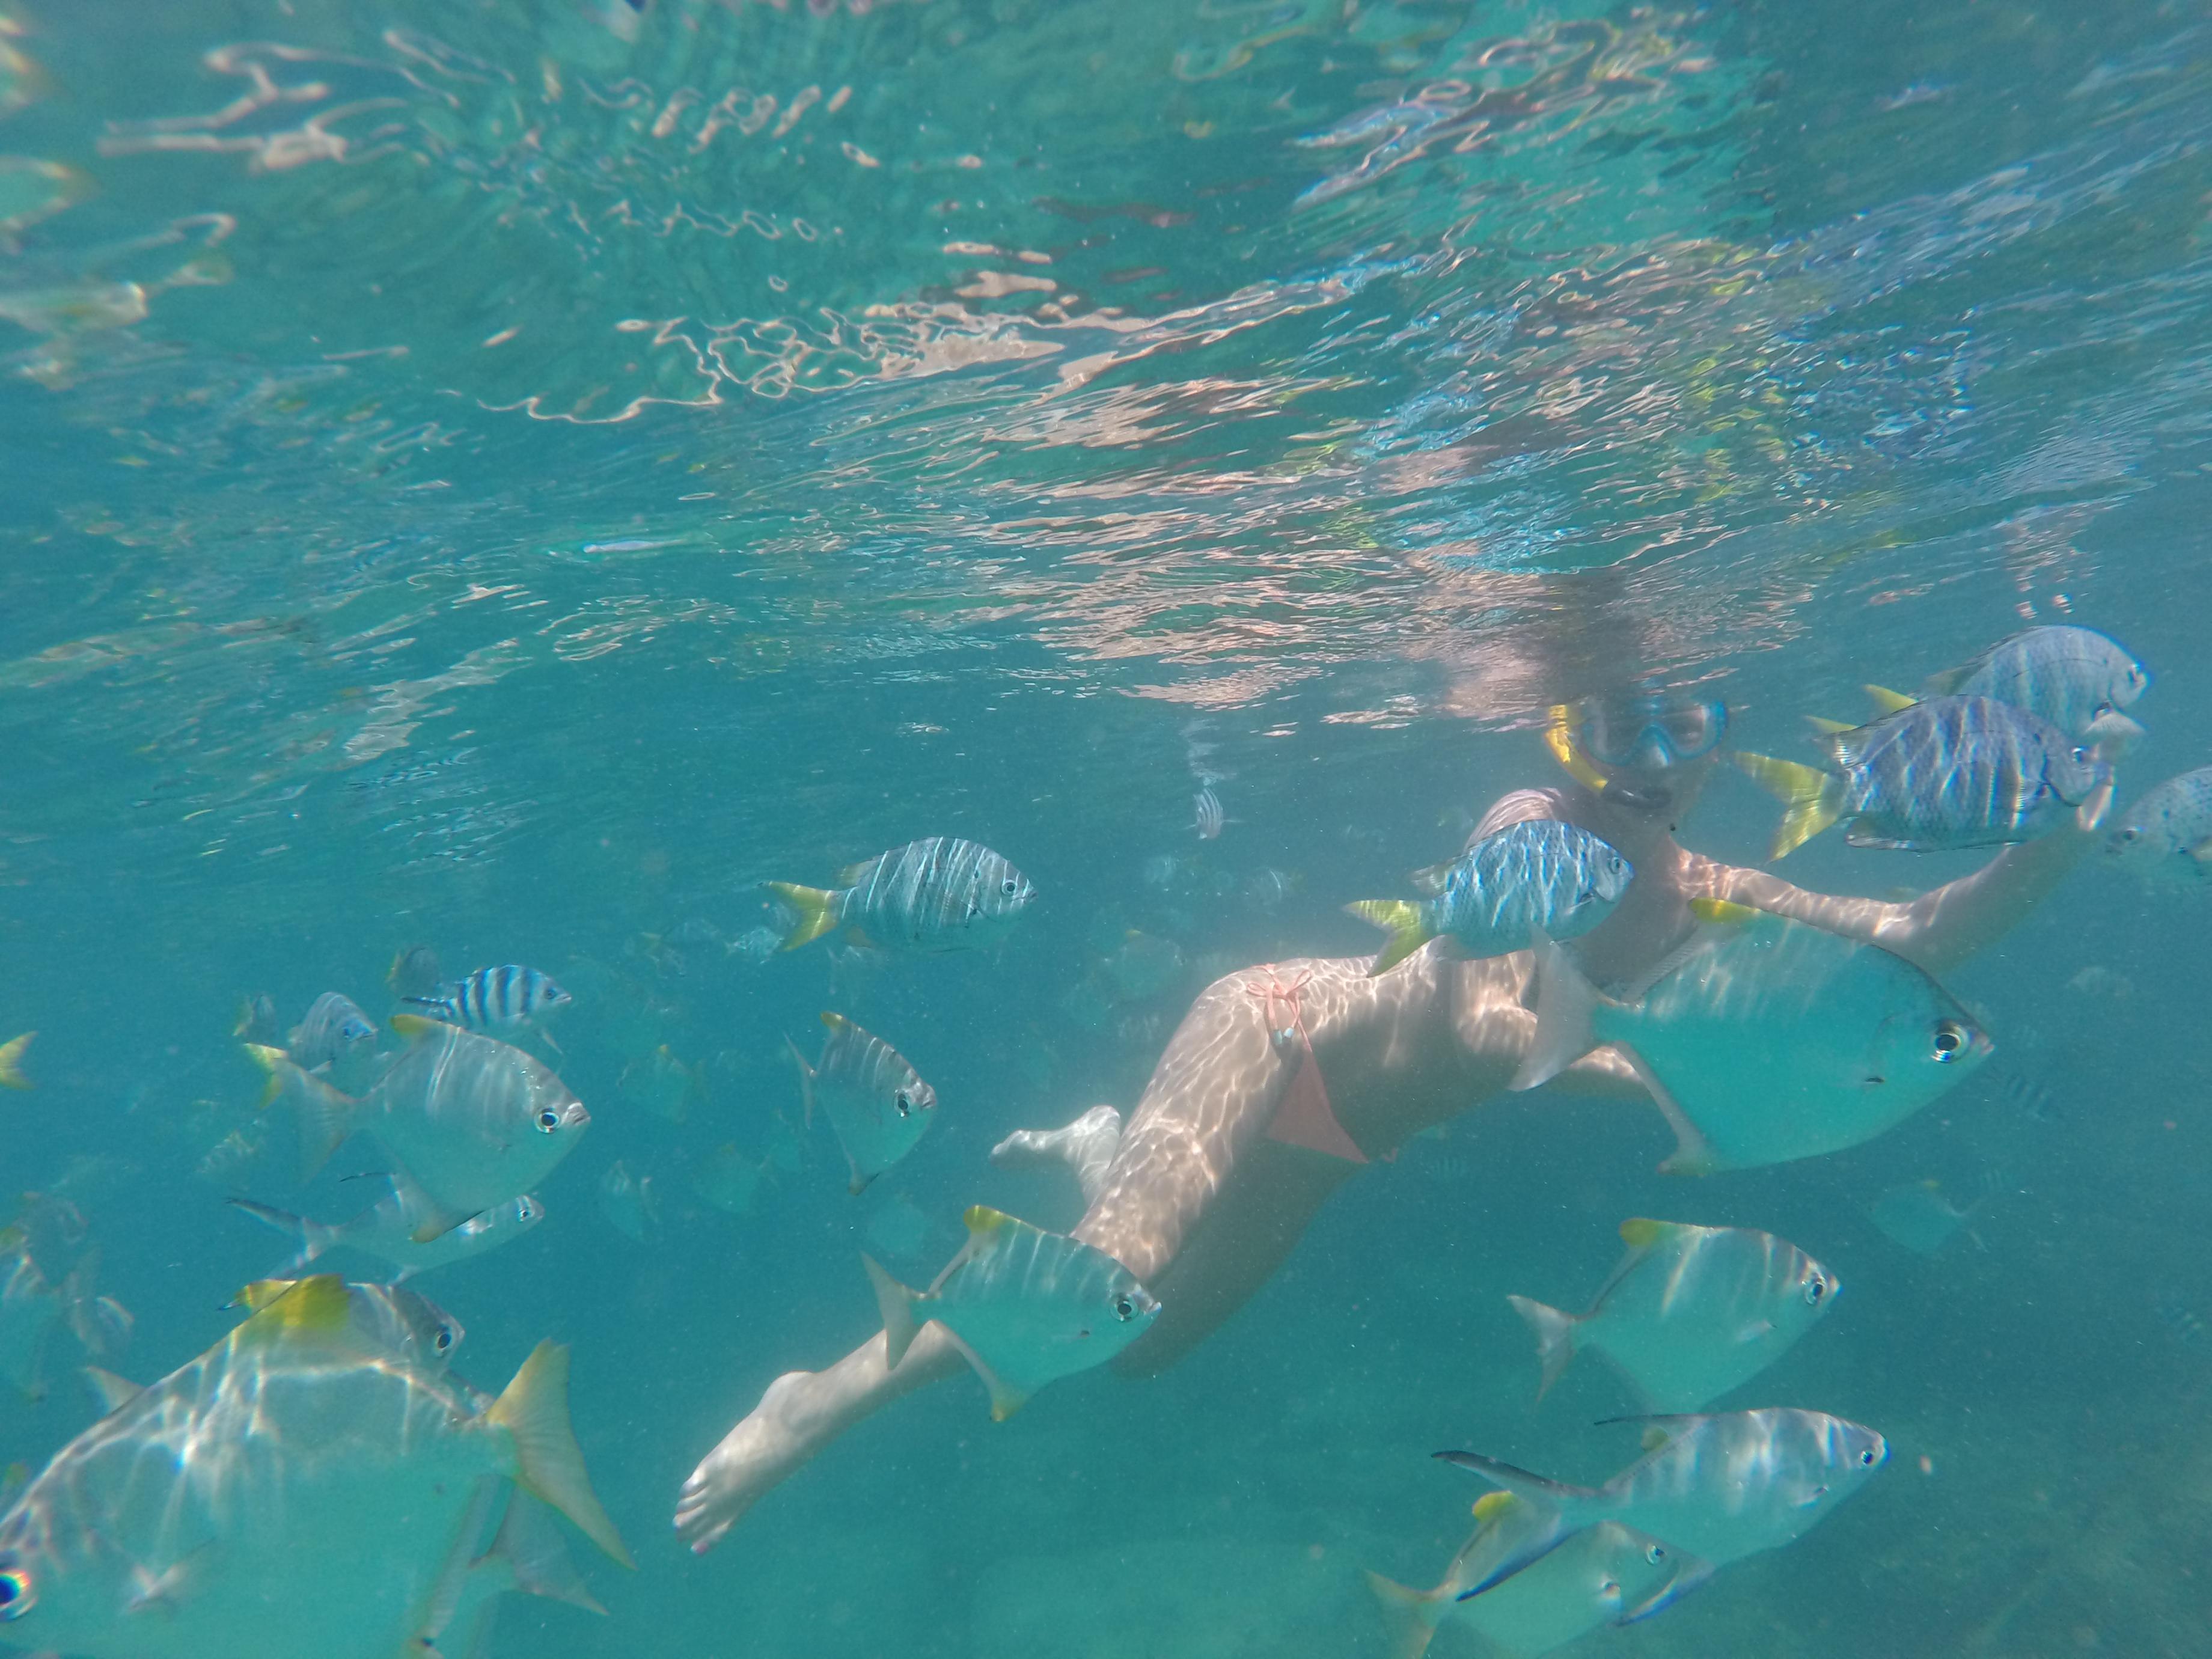 Nye venner under vann